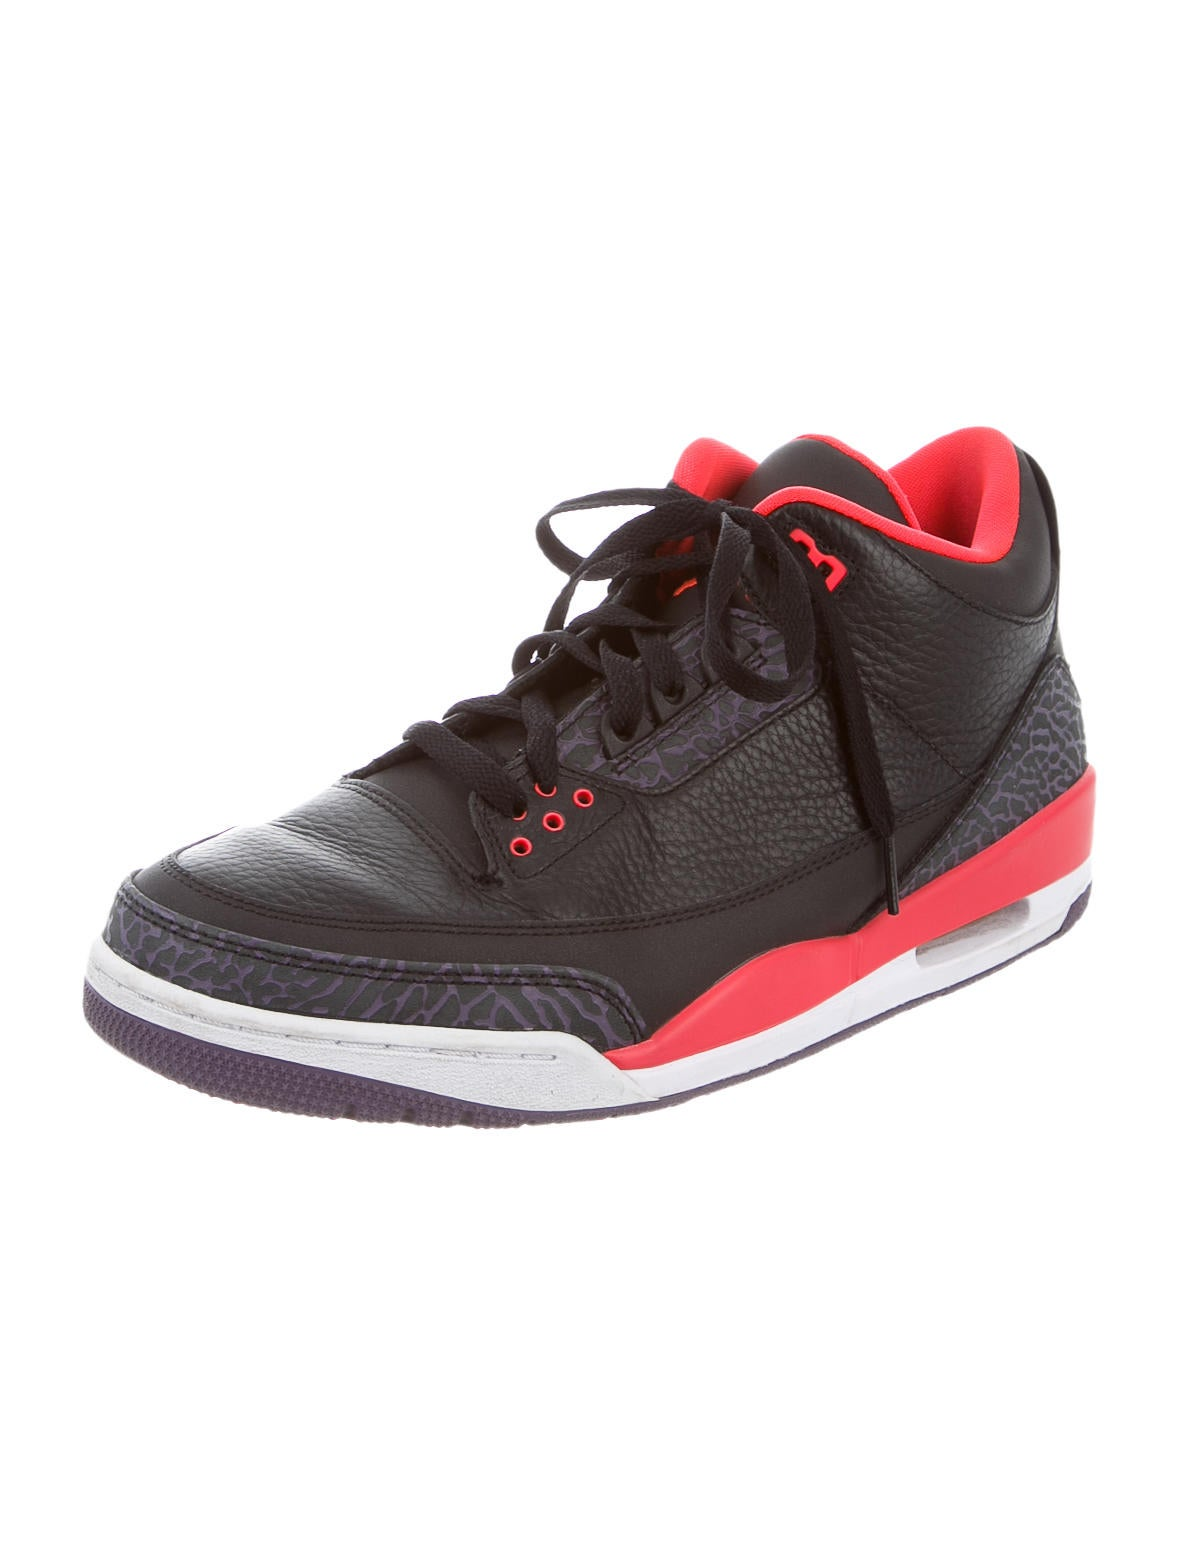 31048c713dc4a Nike Kaws Air Jordan 4